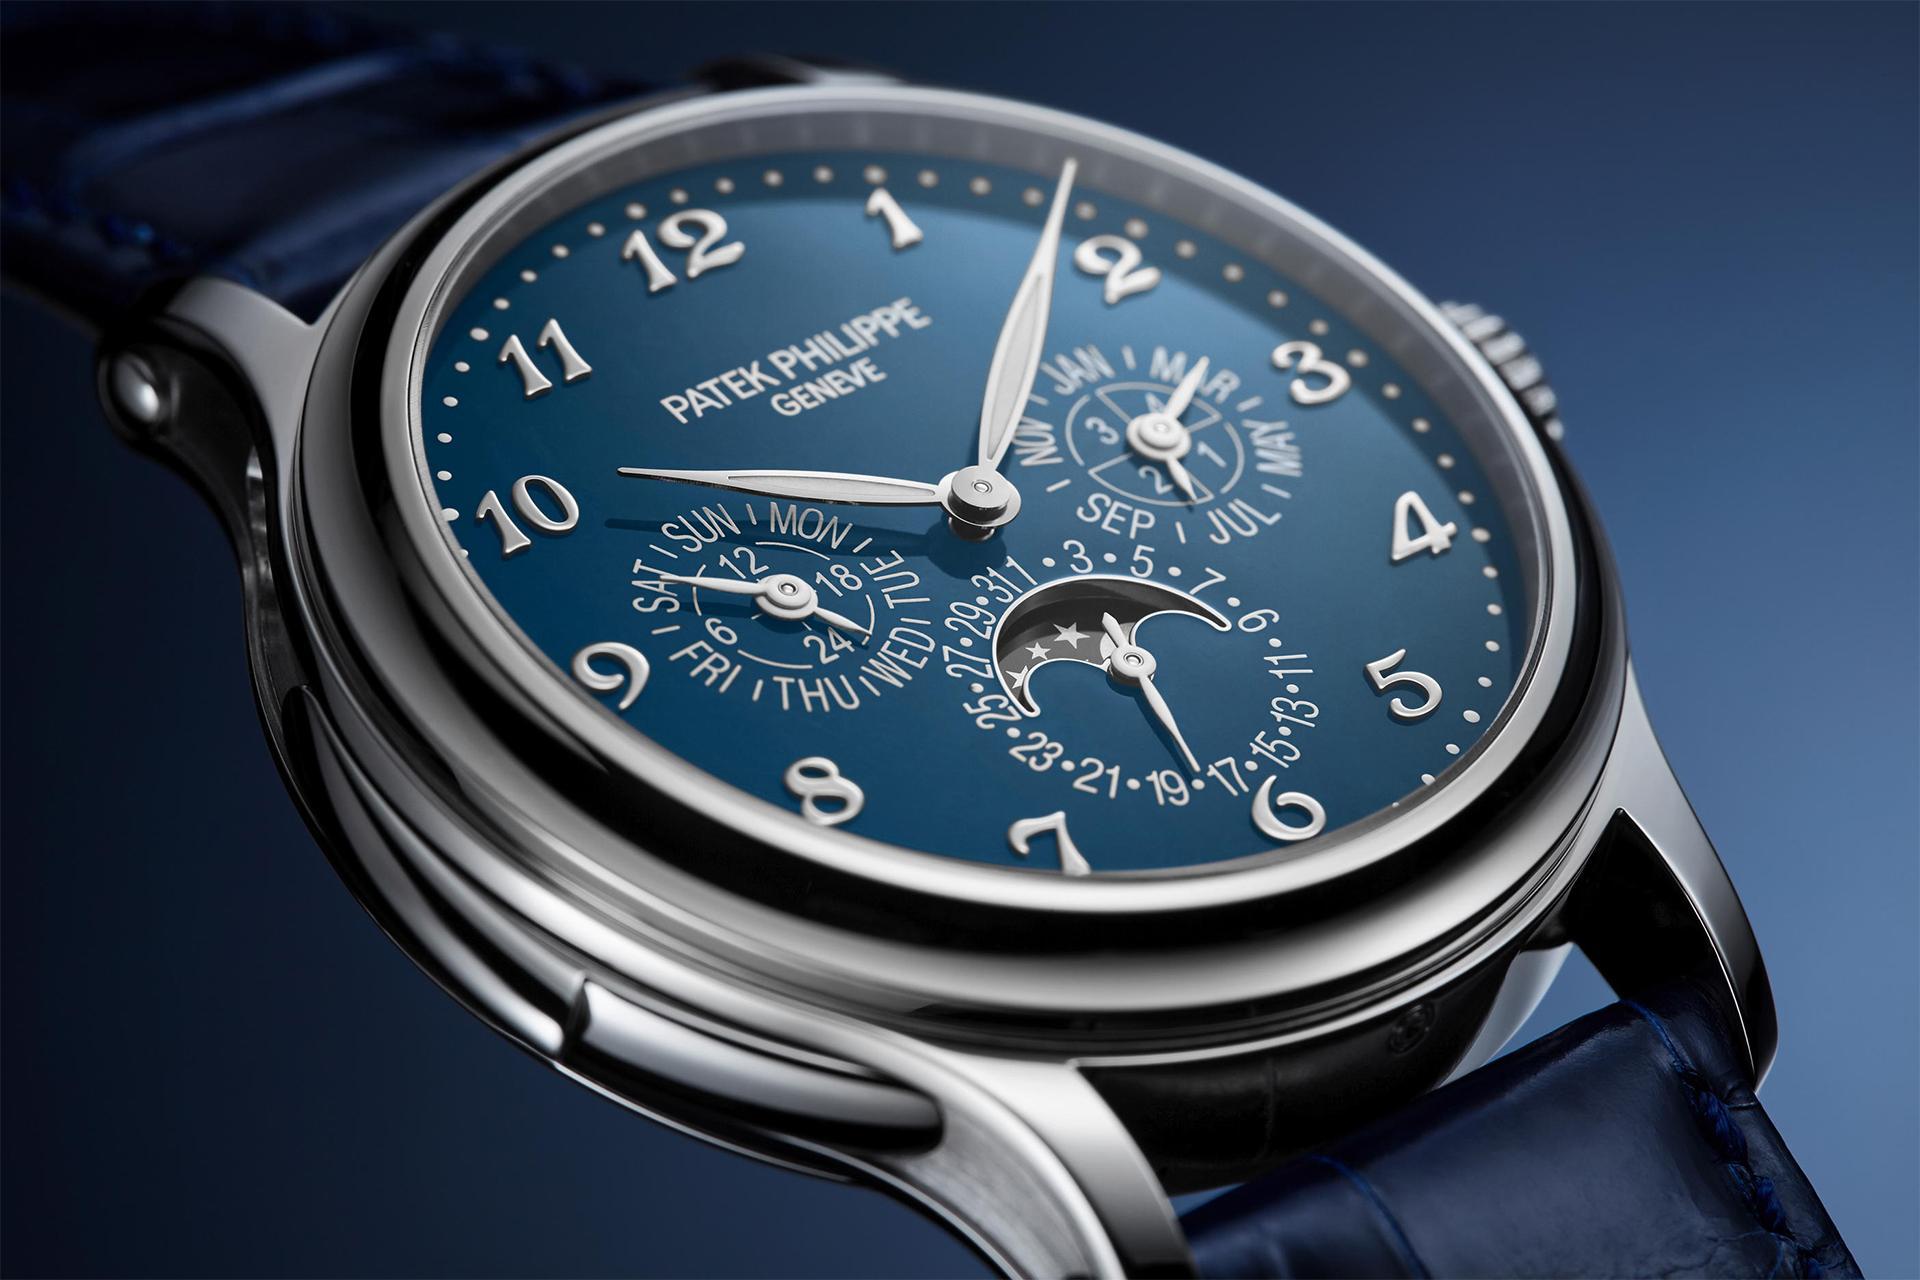 Patek Philippe Minute Repeater with a Perpetual Calendar Ref. 5374G-001 watch